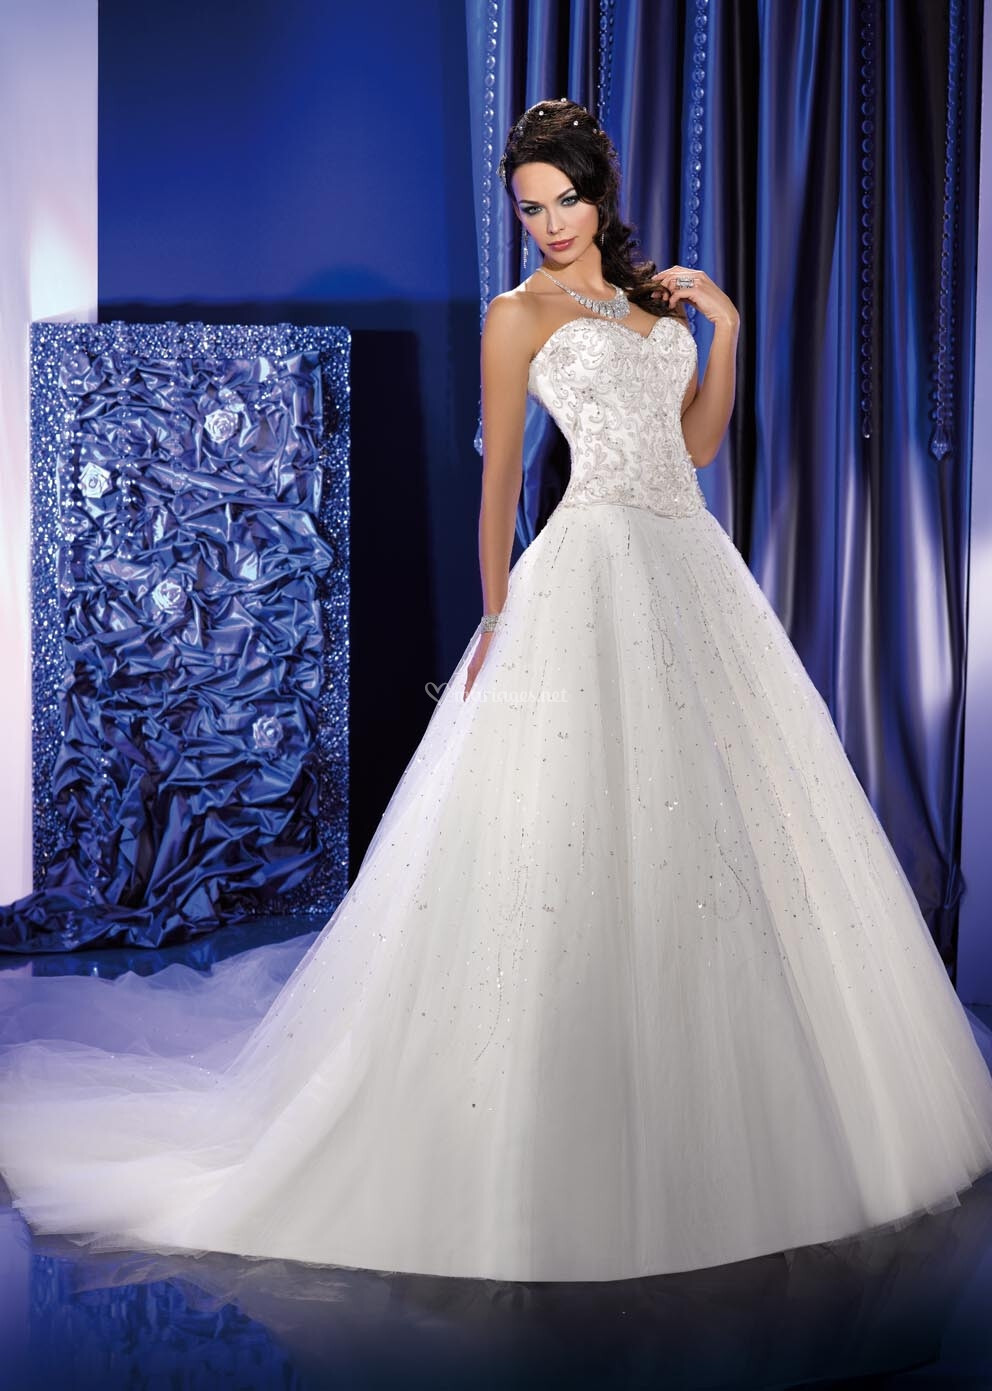 Robes de mari e sur kelly 39 s ks 166 29 30 for Boutiques de robe de mariage kansas city